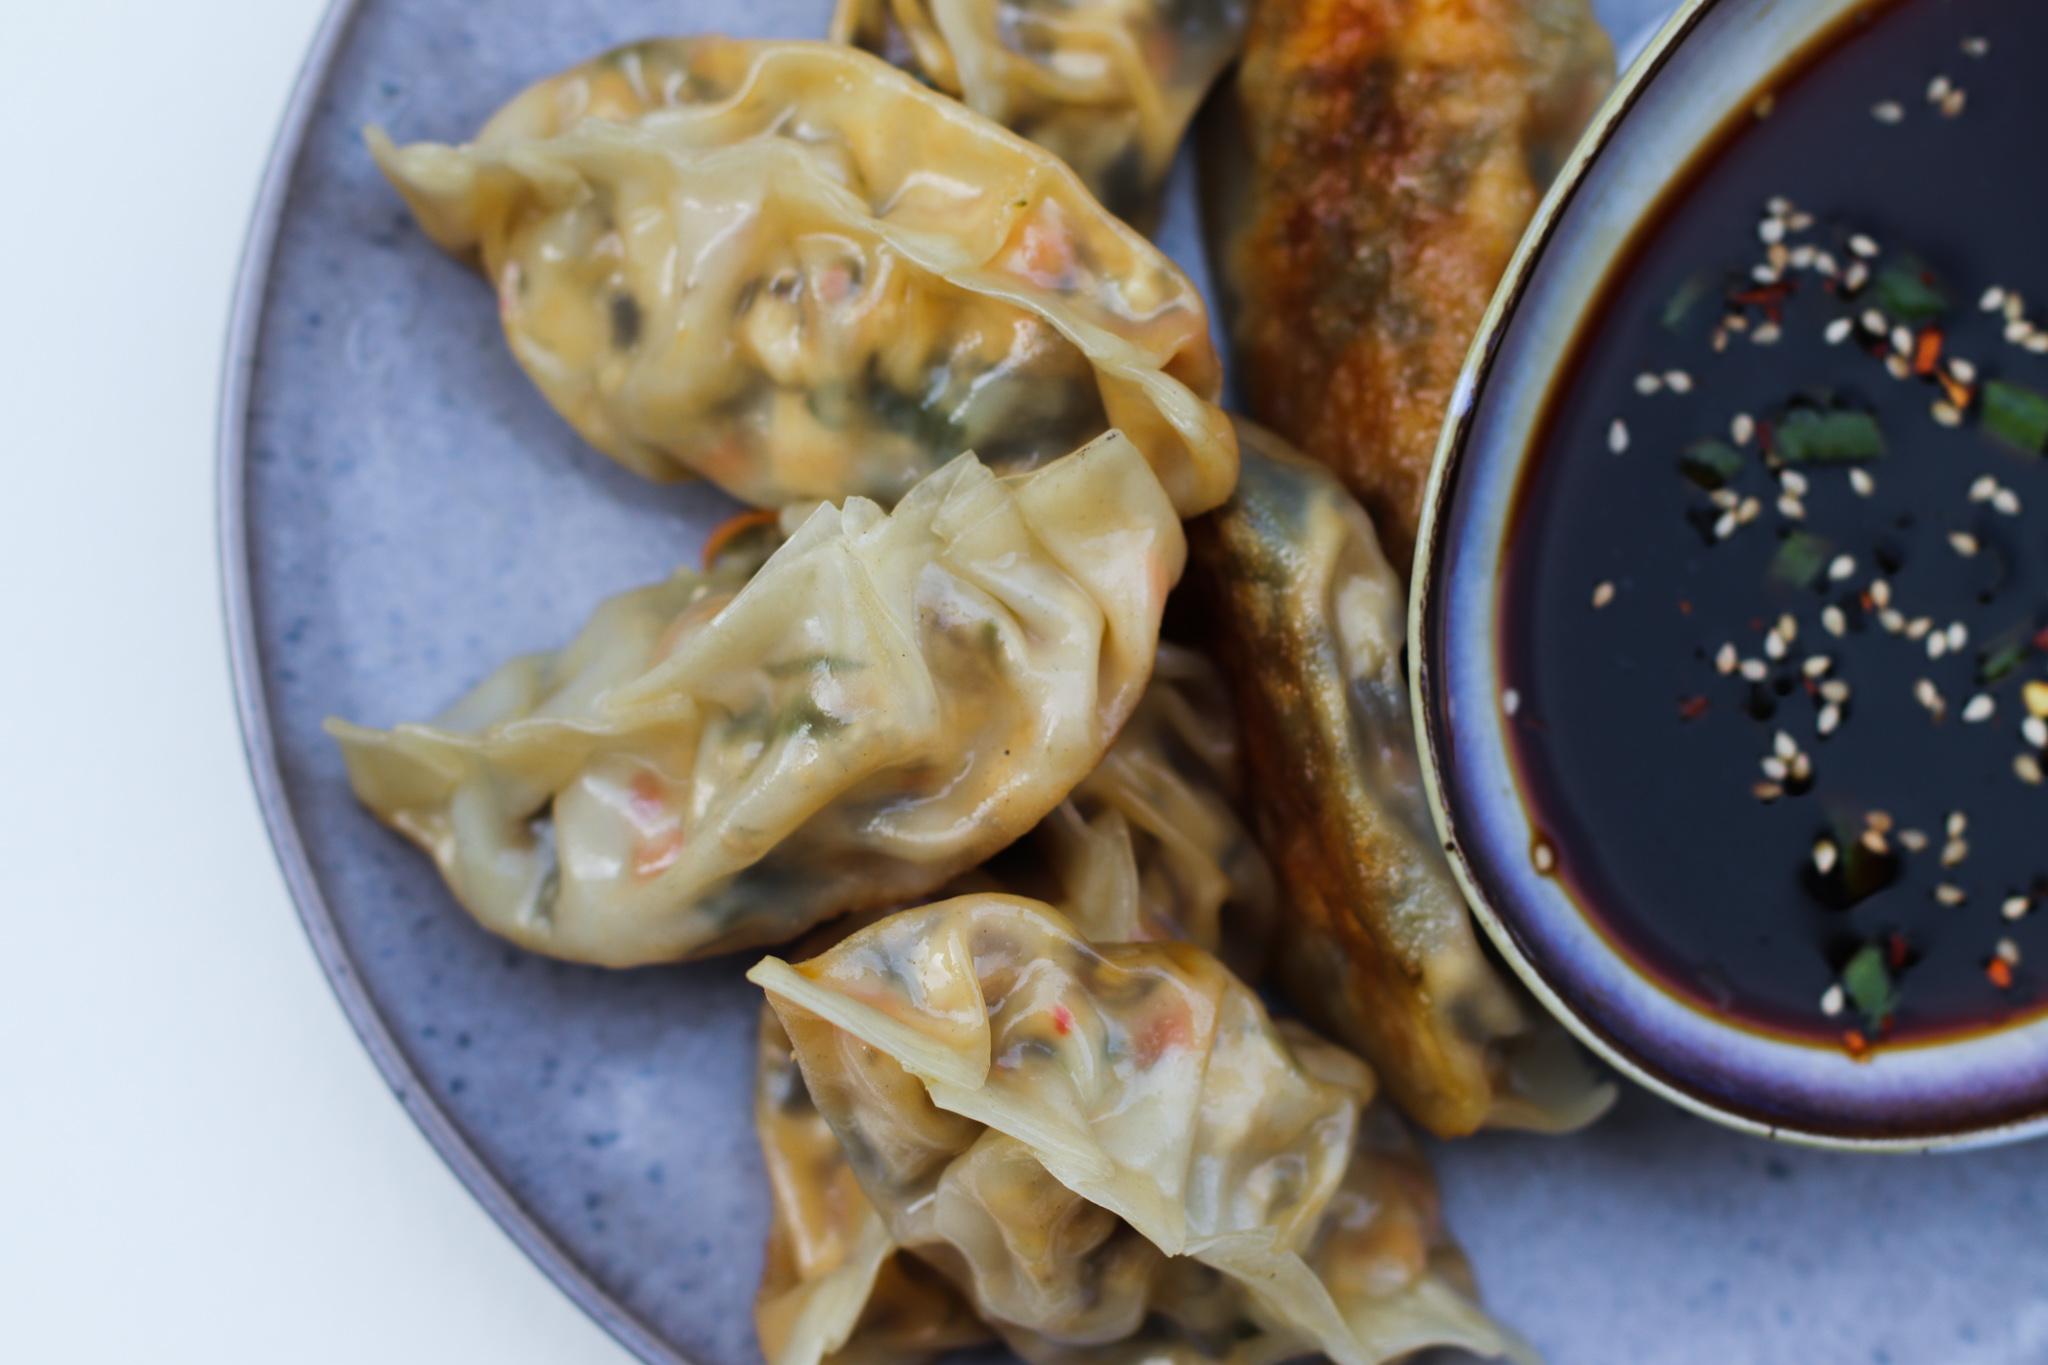 Crispy dumplings with Korean sea salad